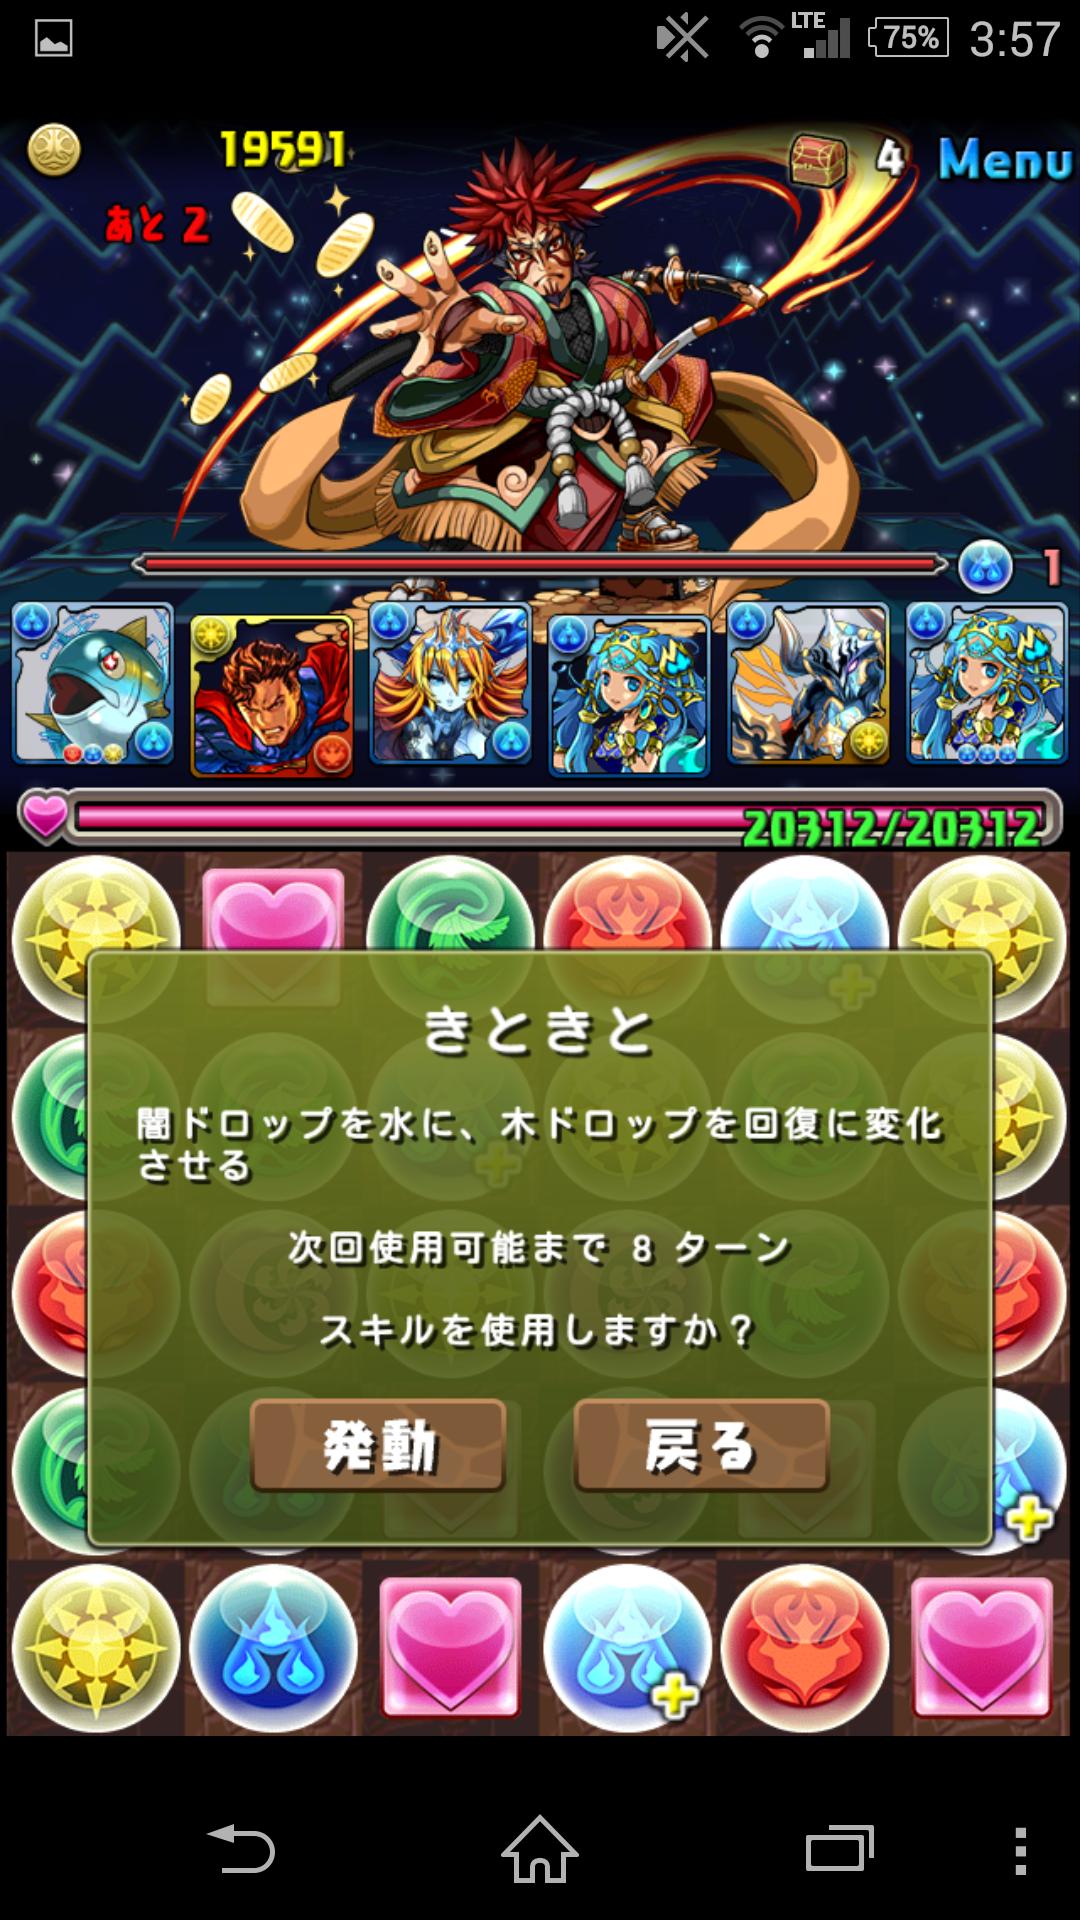 Screenshot_2014-12-16-03-57-11.png